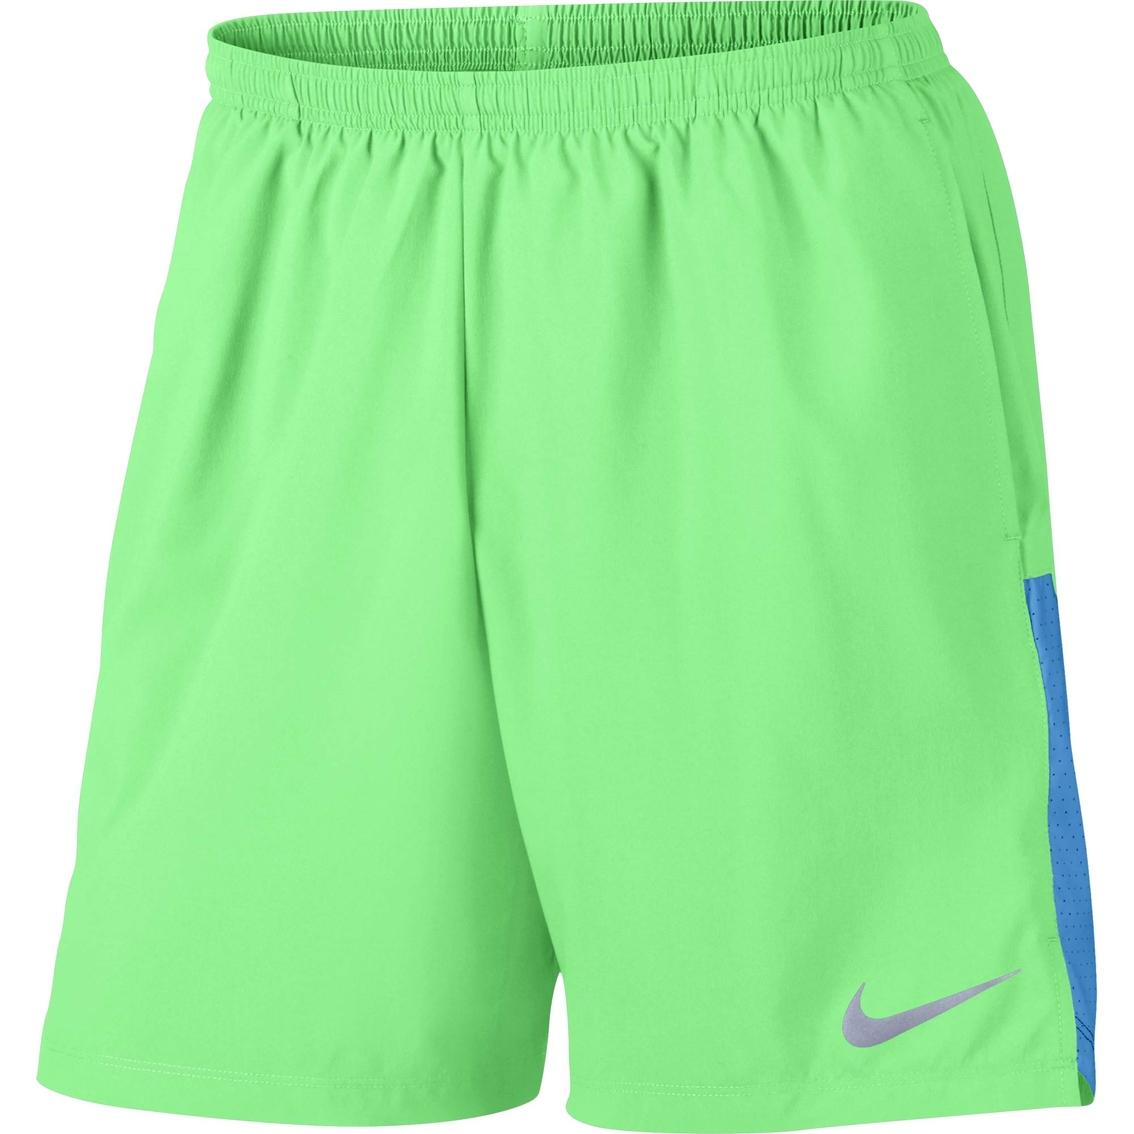 lowest price 87db4 42576 Nike Men s 7 in. Flex Challenger Running Shorts